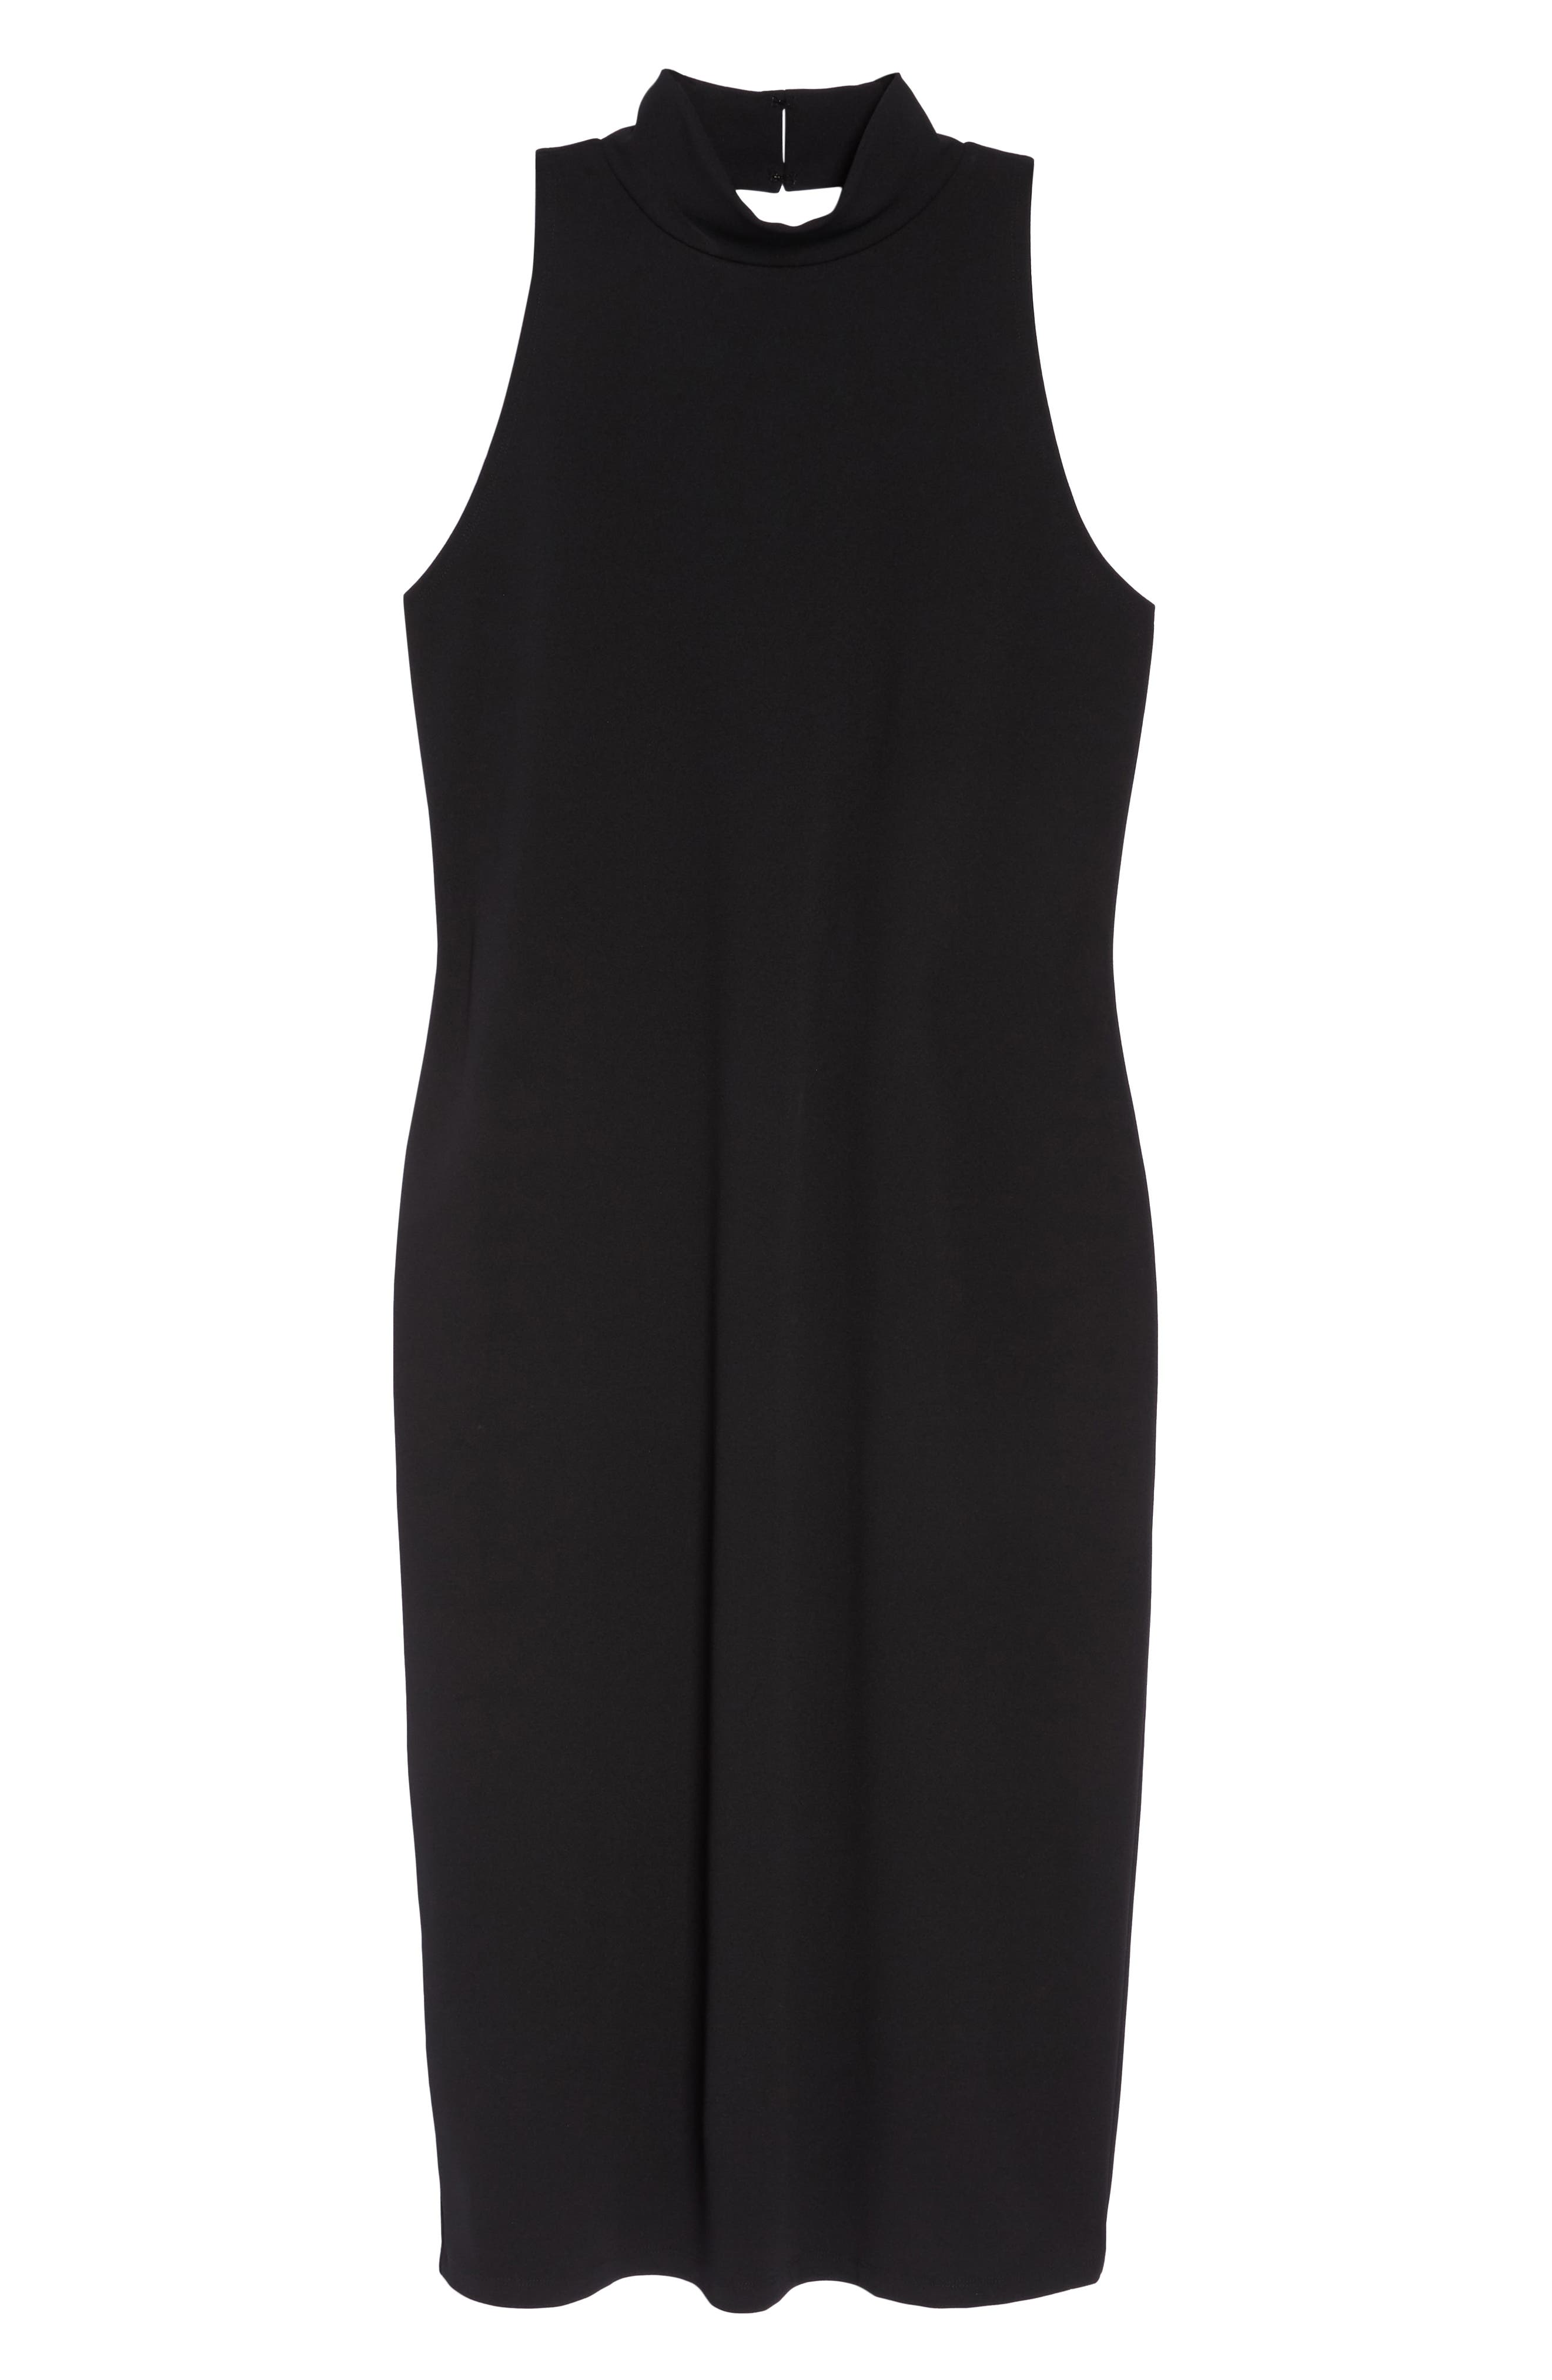 Mock Neck Body-Con Dress,                             Alternate thumbnail 12, color,                             BLACK